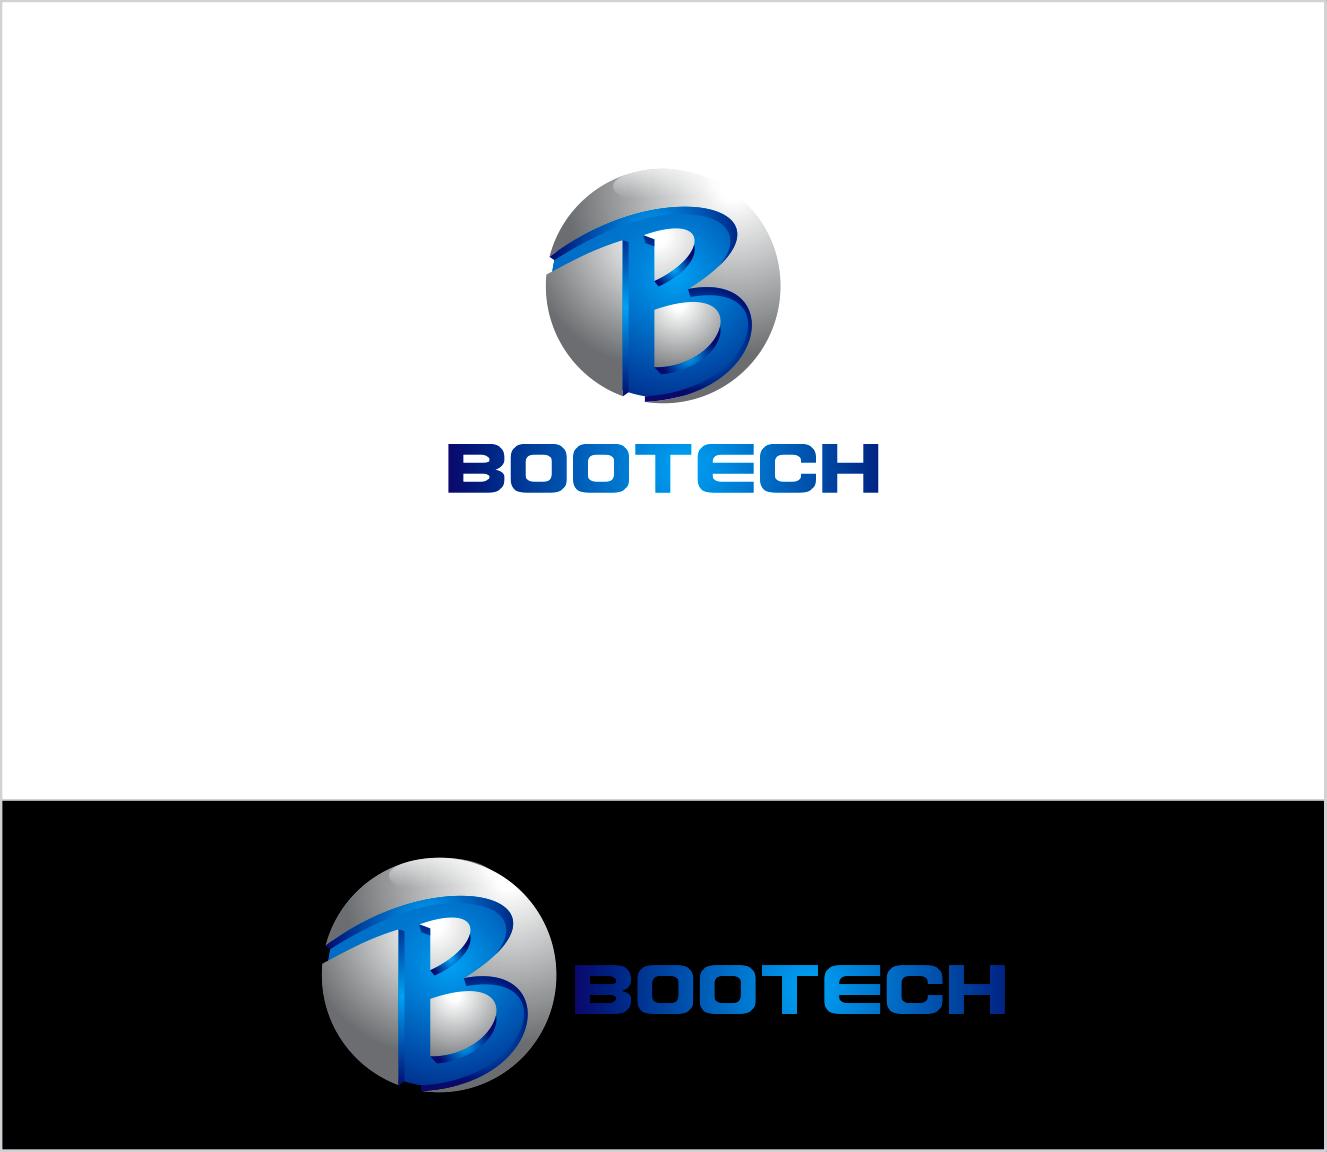 Logo Design by Private User - Entry No. 82 in the Logo Design Contest Fun Logo Design for Bootech.